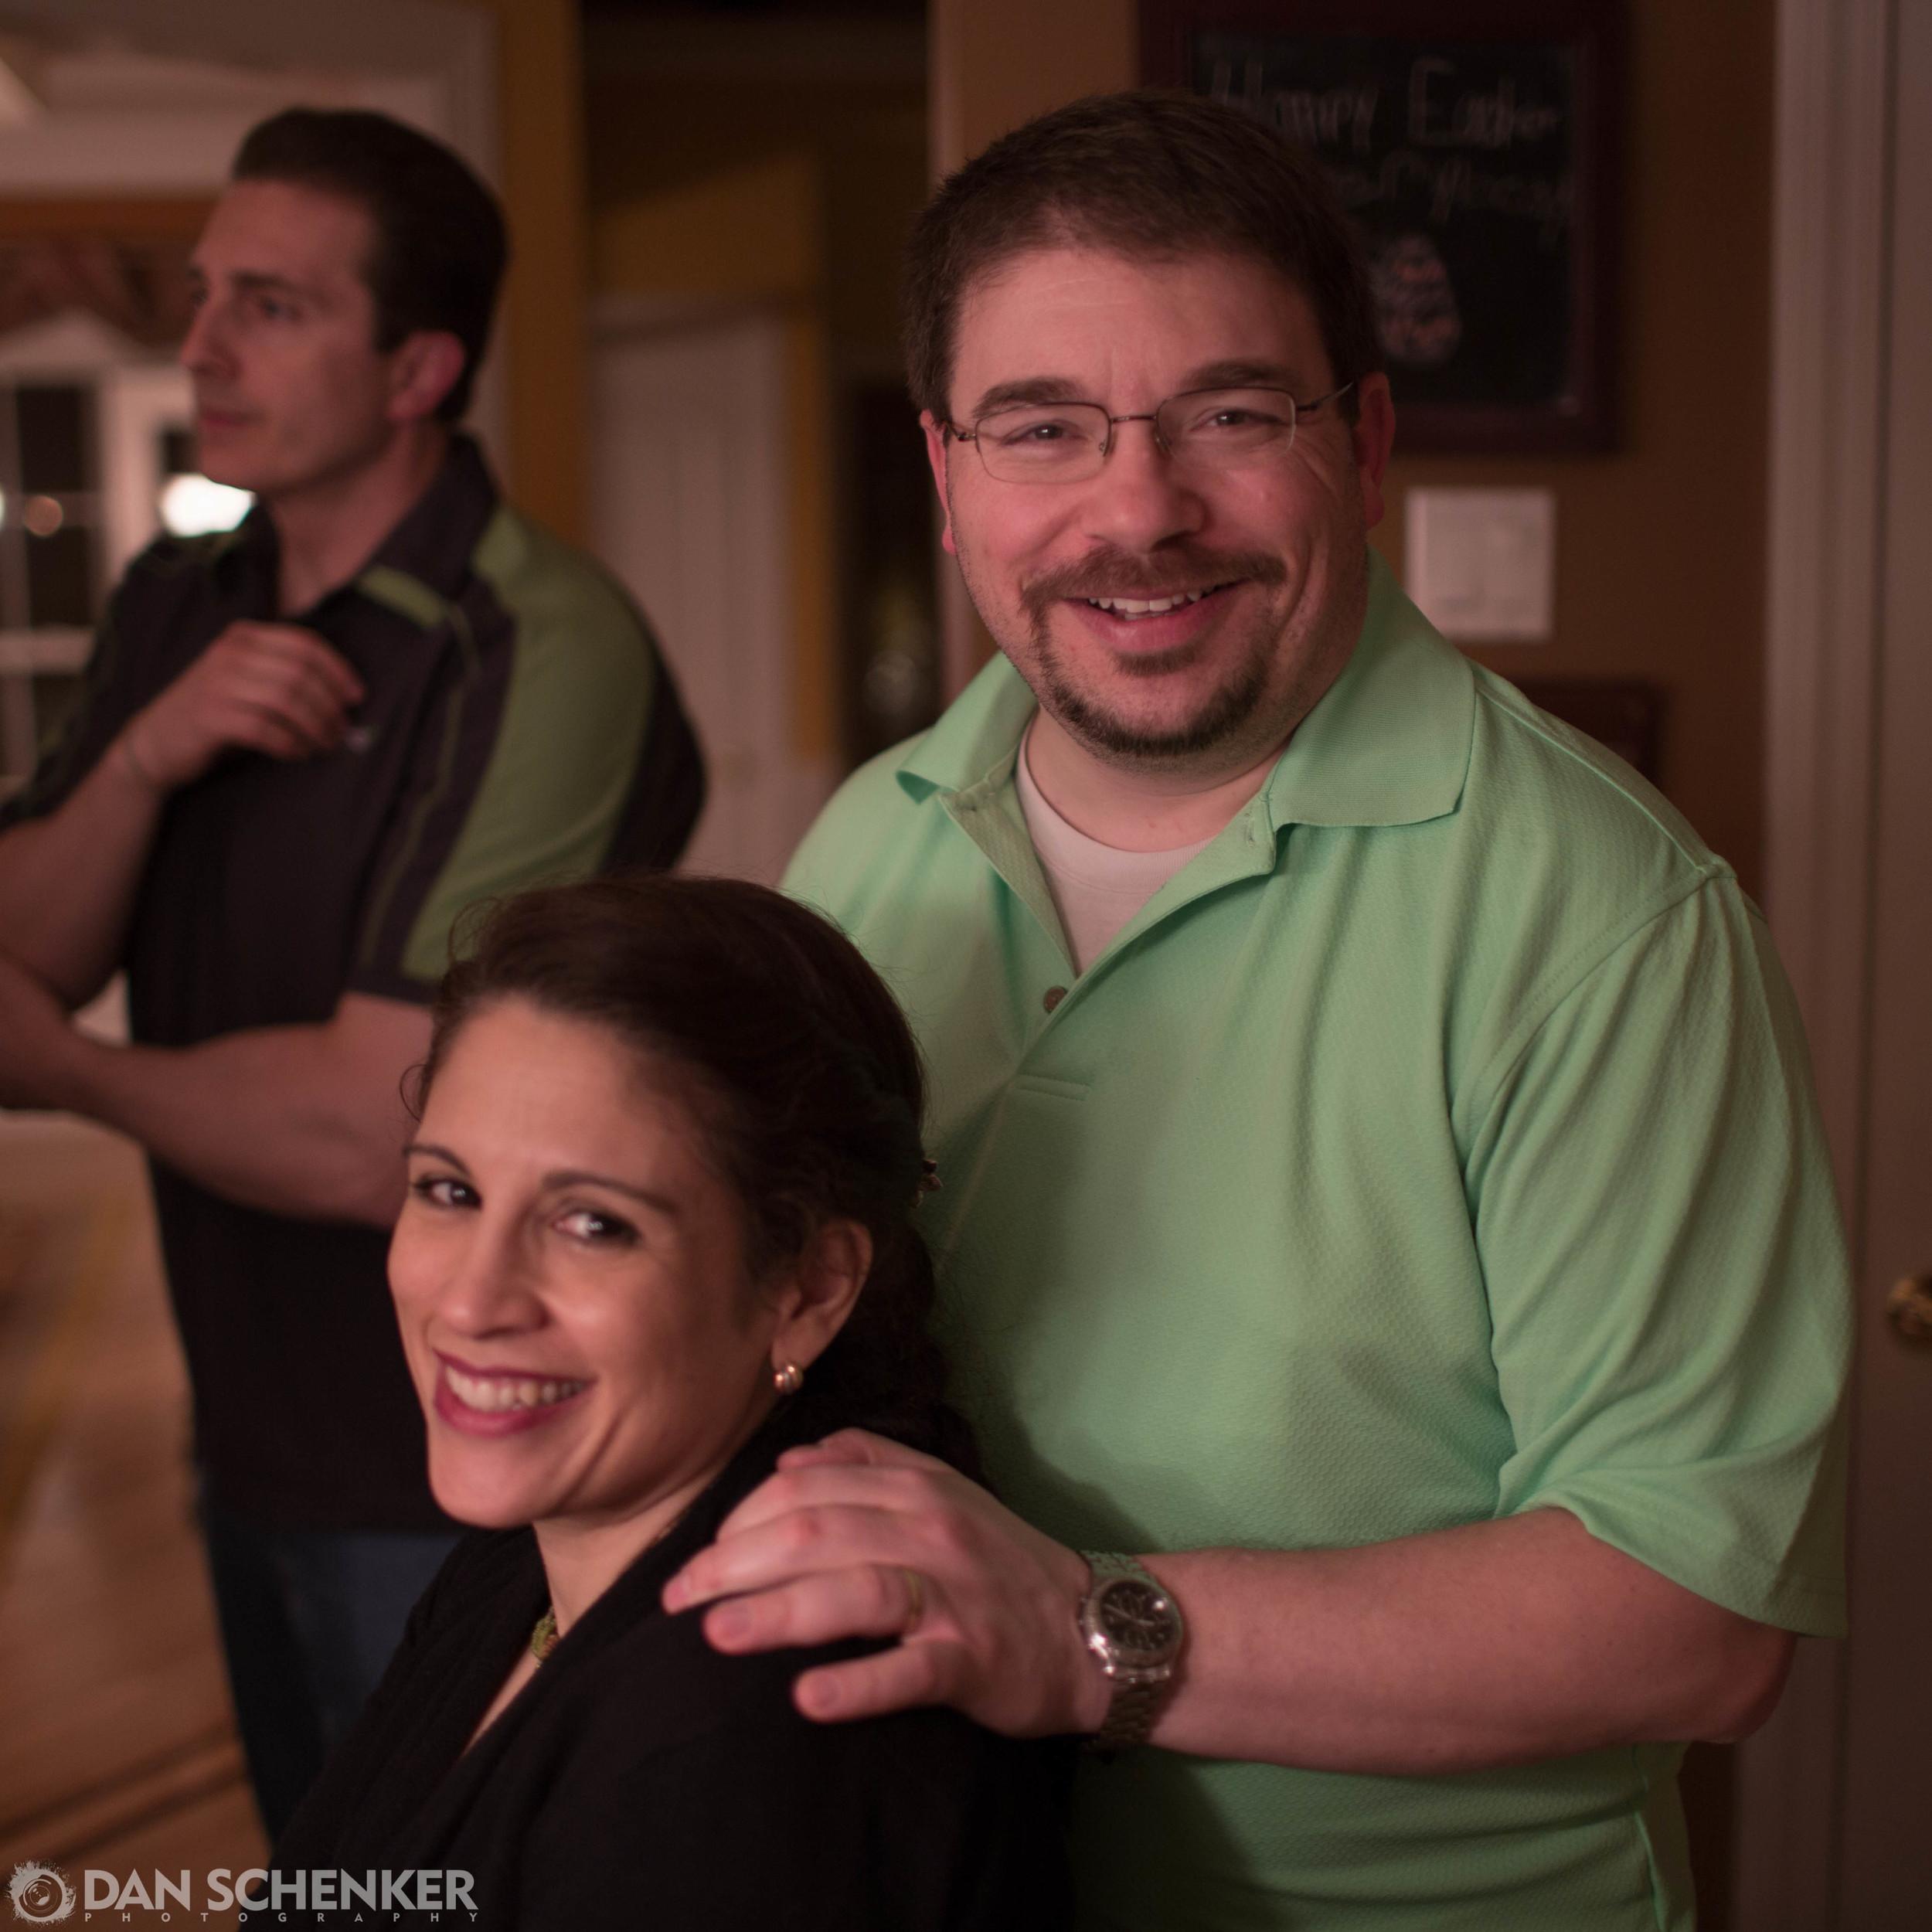 D'aww, it's Alicia and Dan celebrating Alicia's promotion.